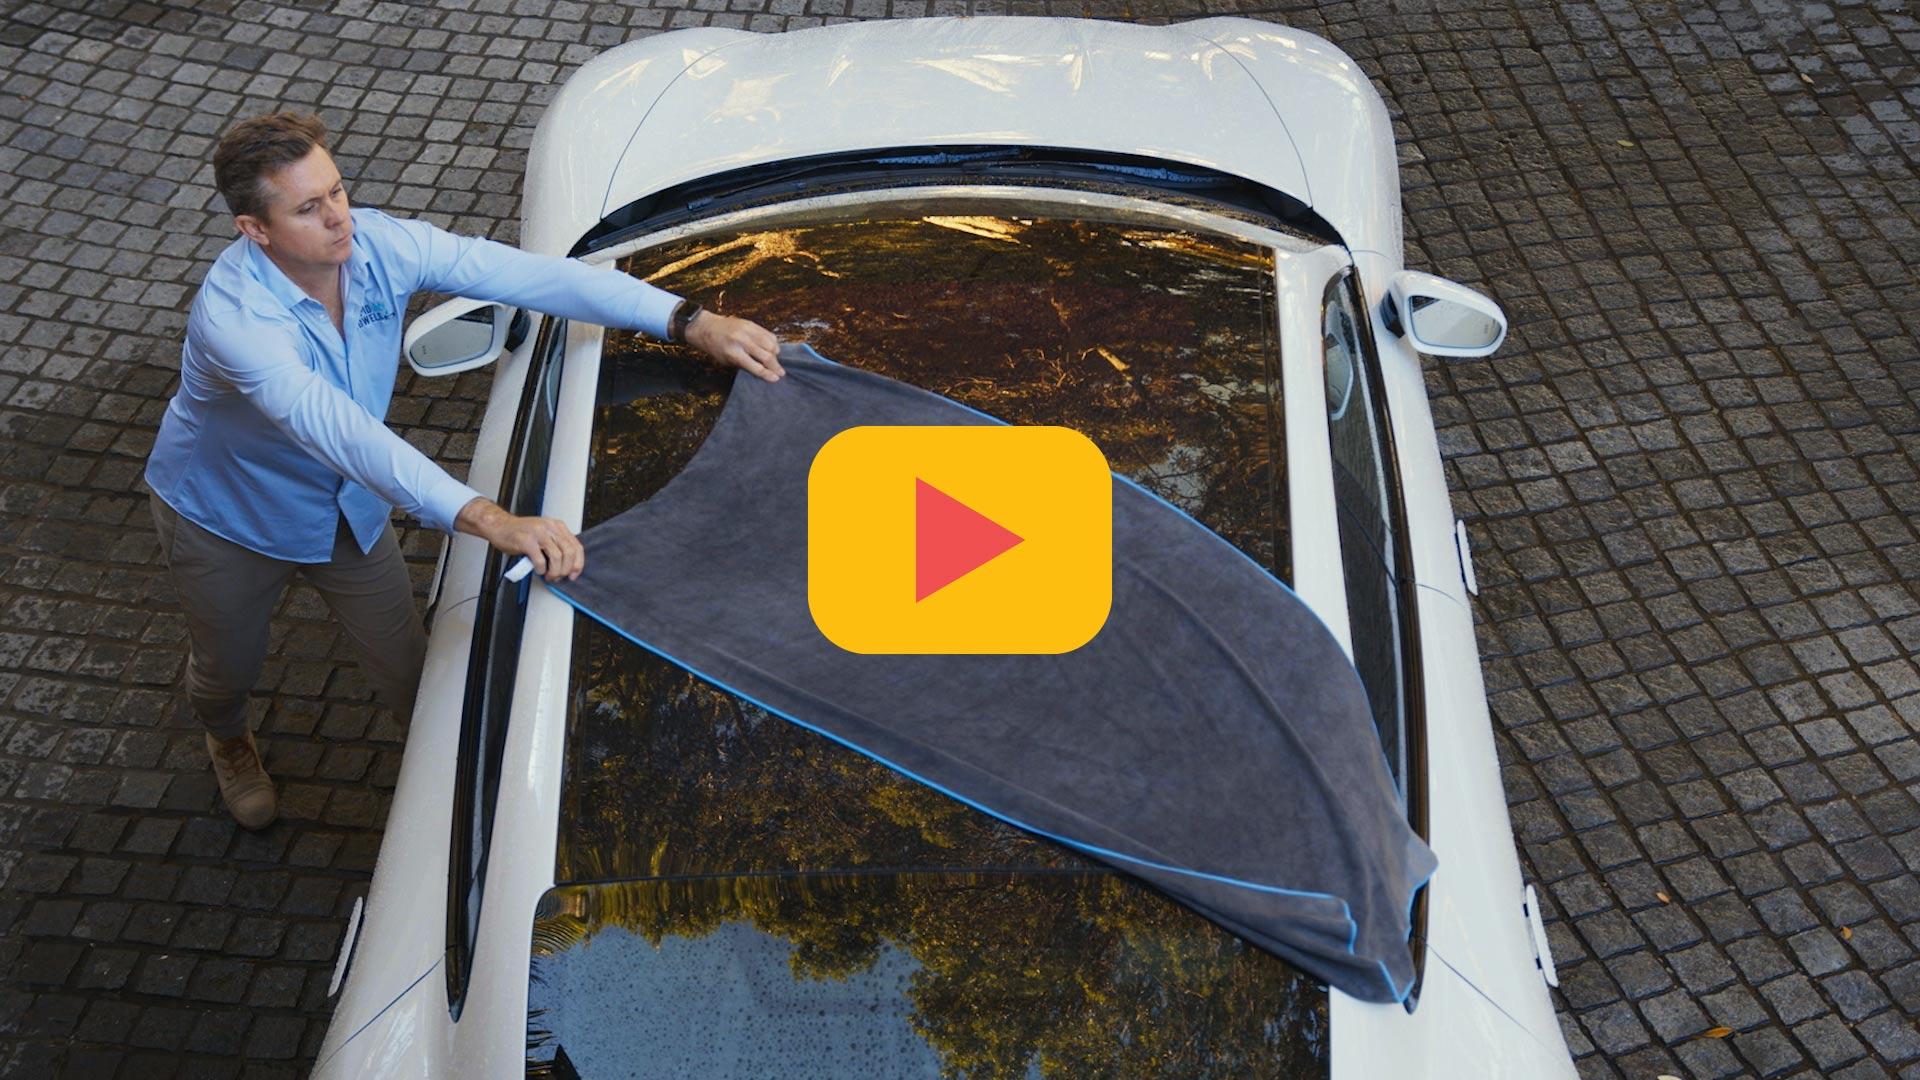 Rapid Dry Towels Explainer Video